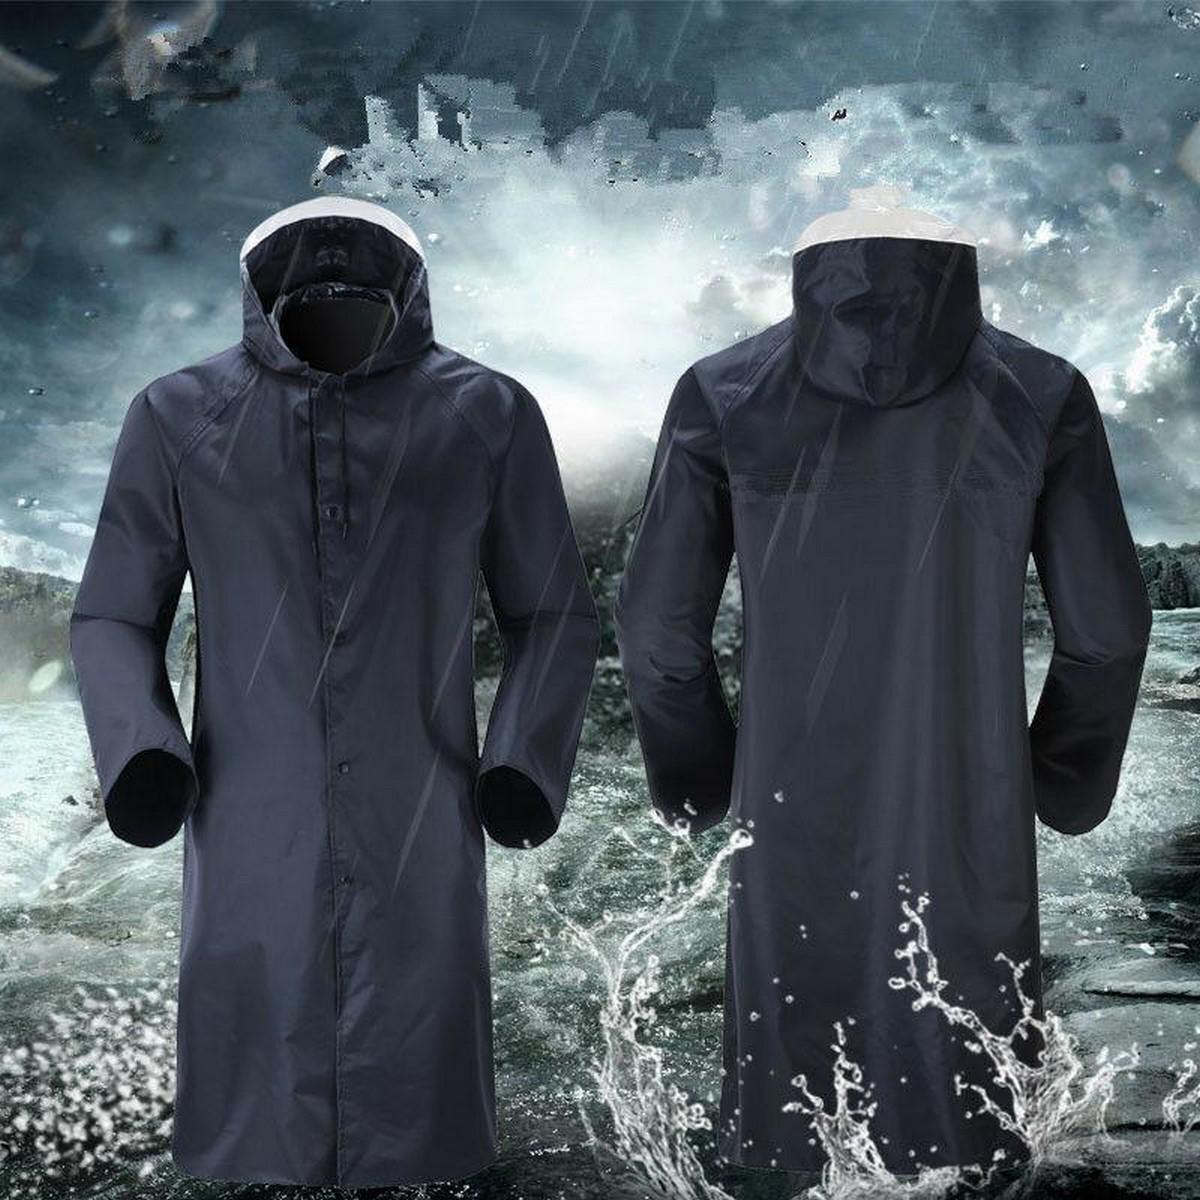 Mens Portable Long Outdoor Waterproof Hooded Trench Coat Rain Coat Rainwear Clothing Raincoat Breathable Quick-Drying Jackets Raincoat.